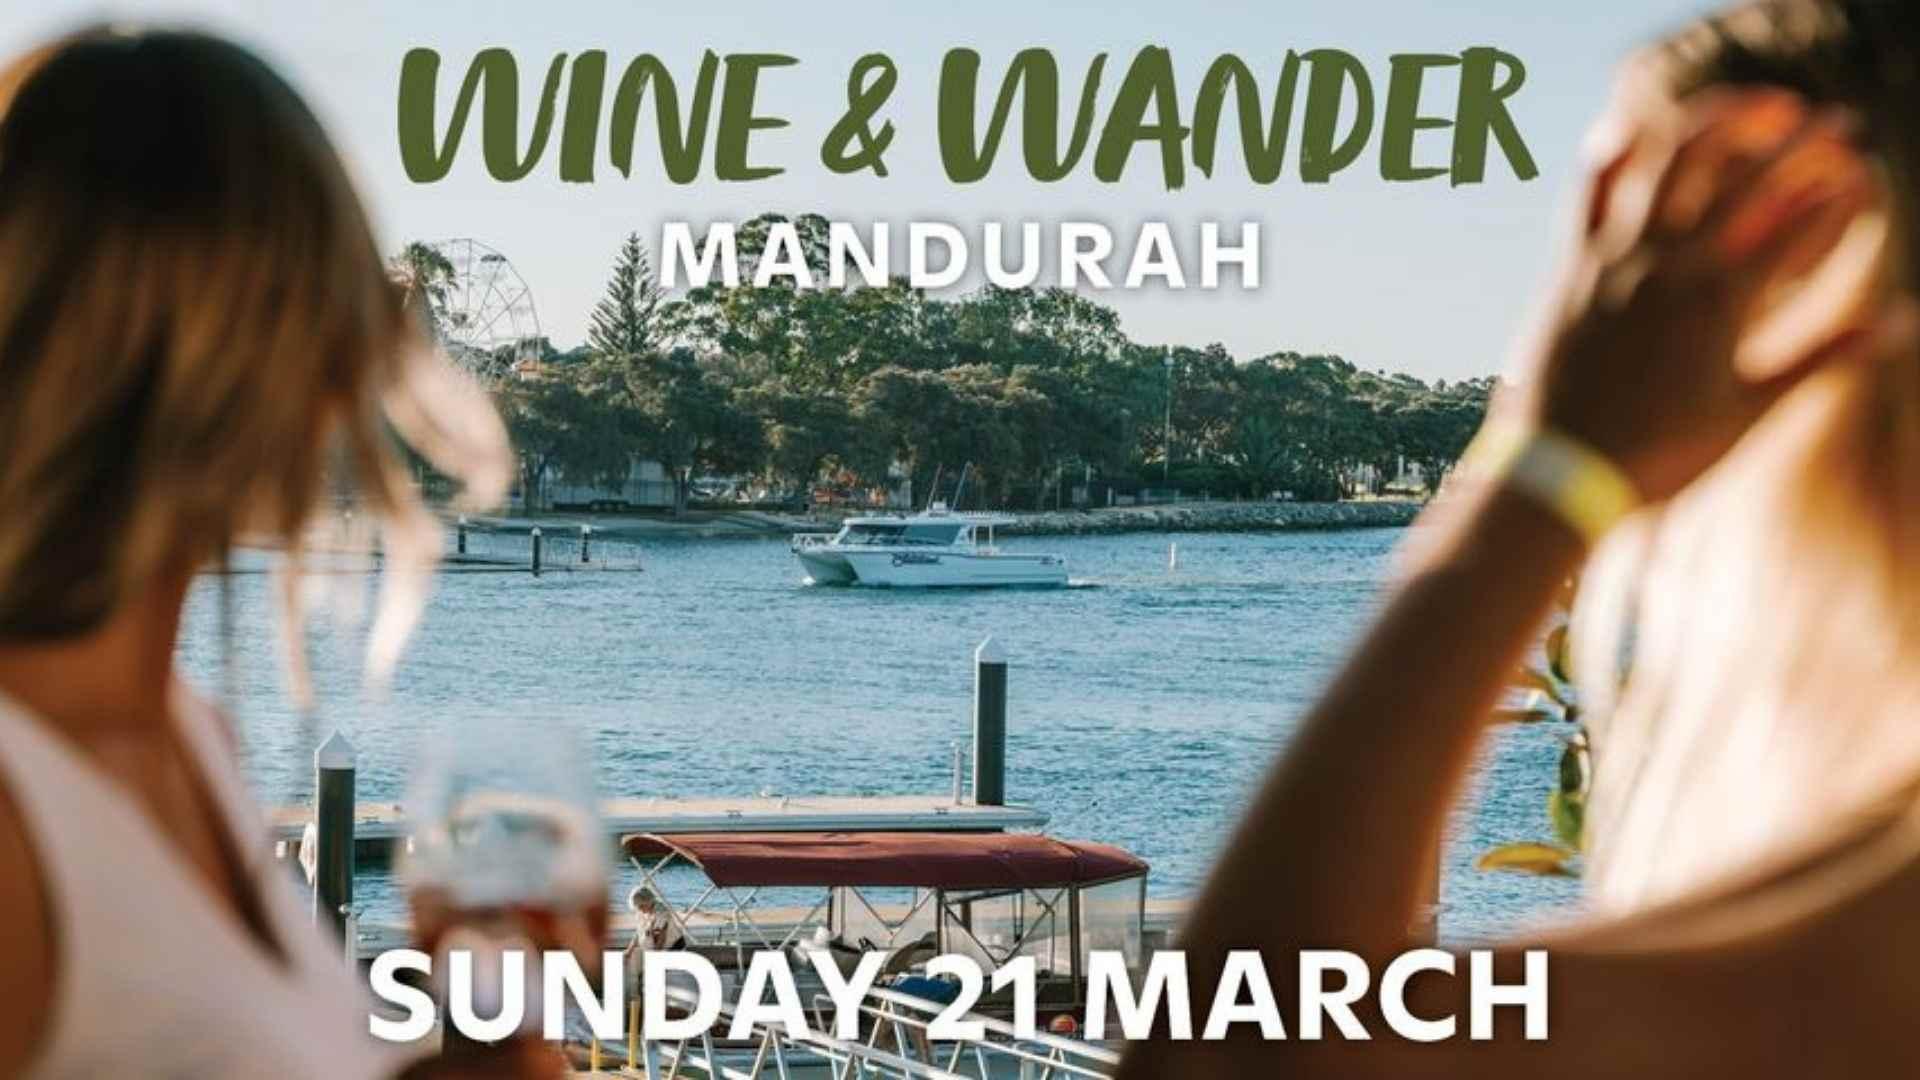 Kanyana-festival-mandurah-wine-and-wander